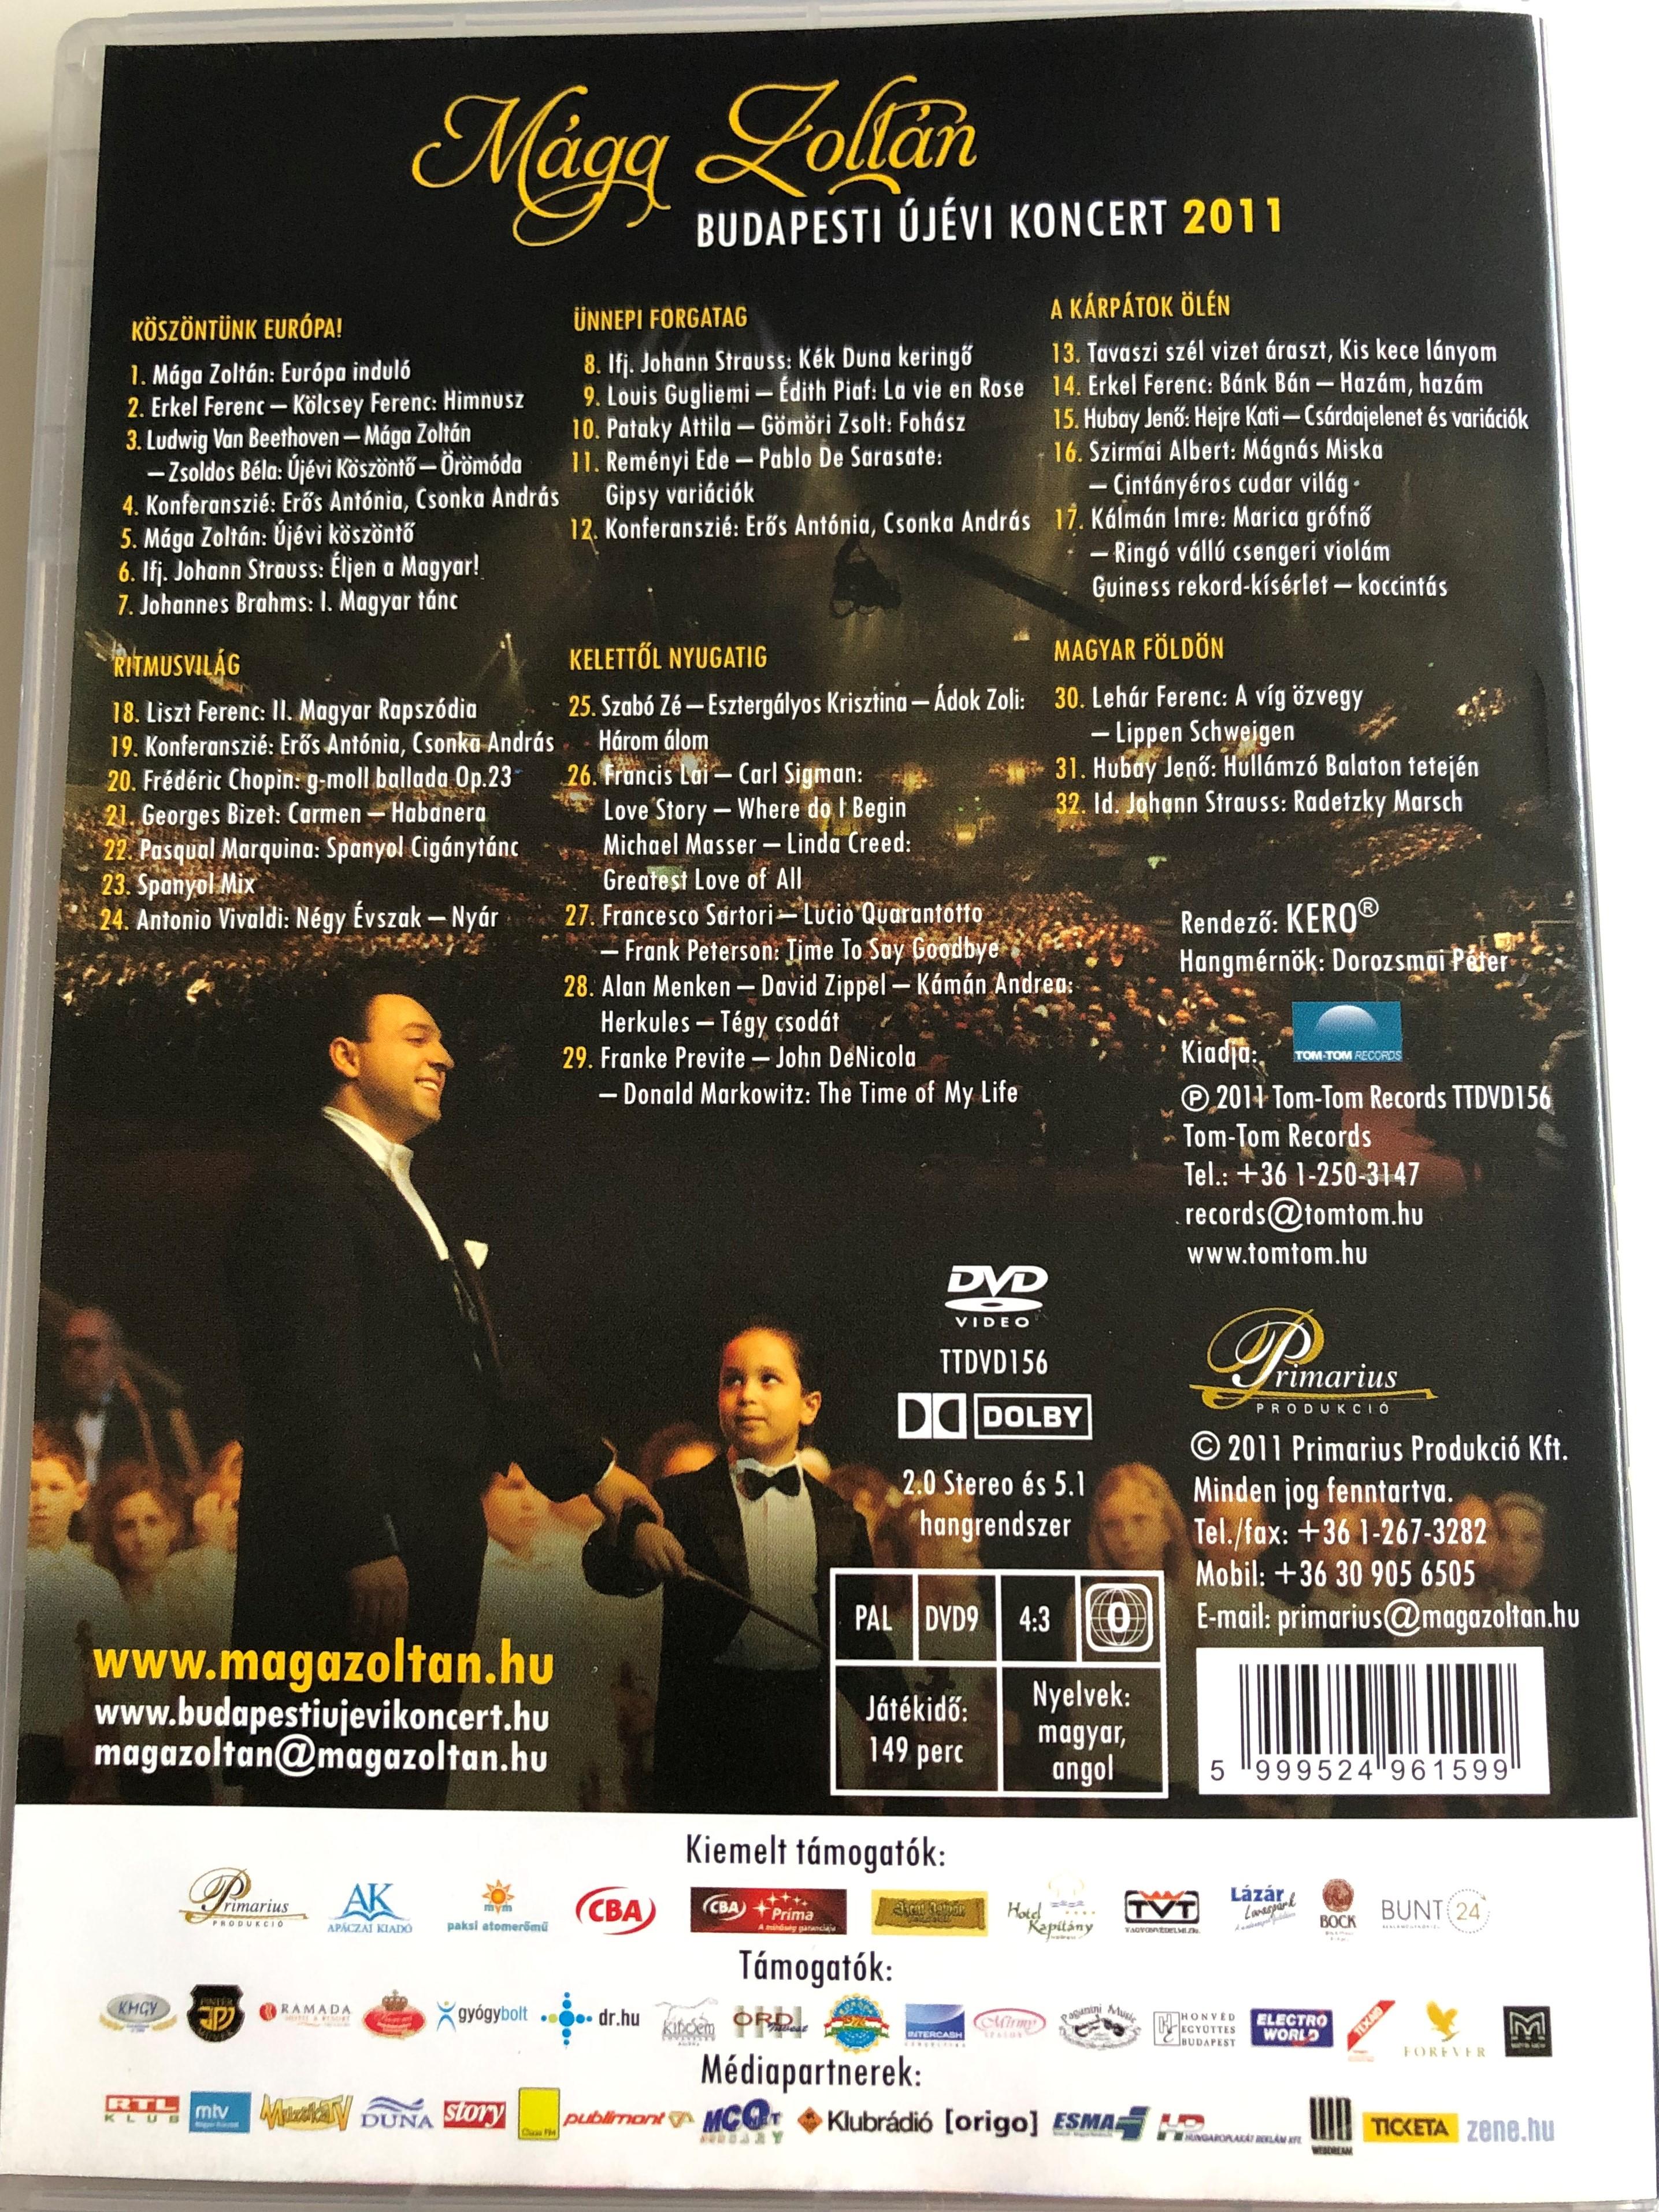 m-ga-zolt-n-2011-budapesti-j-vi-koncert-dvd-2011-tom-tom-records-ttdvd-156-7-.jpg